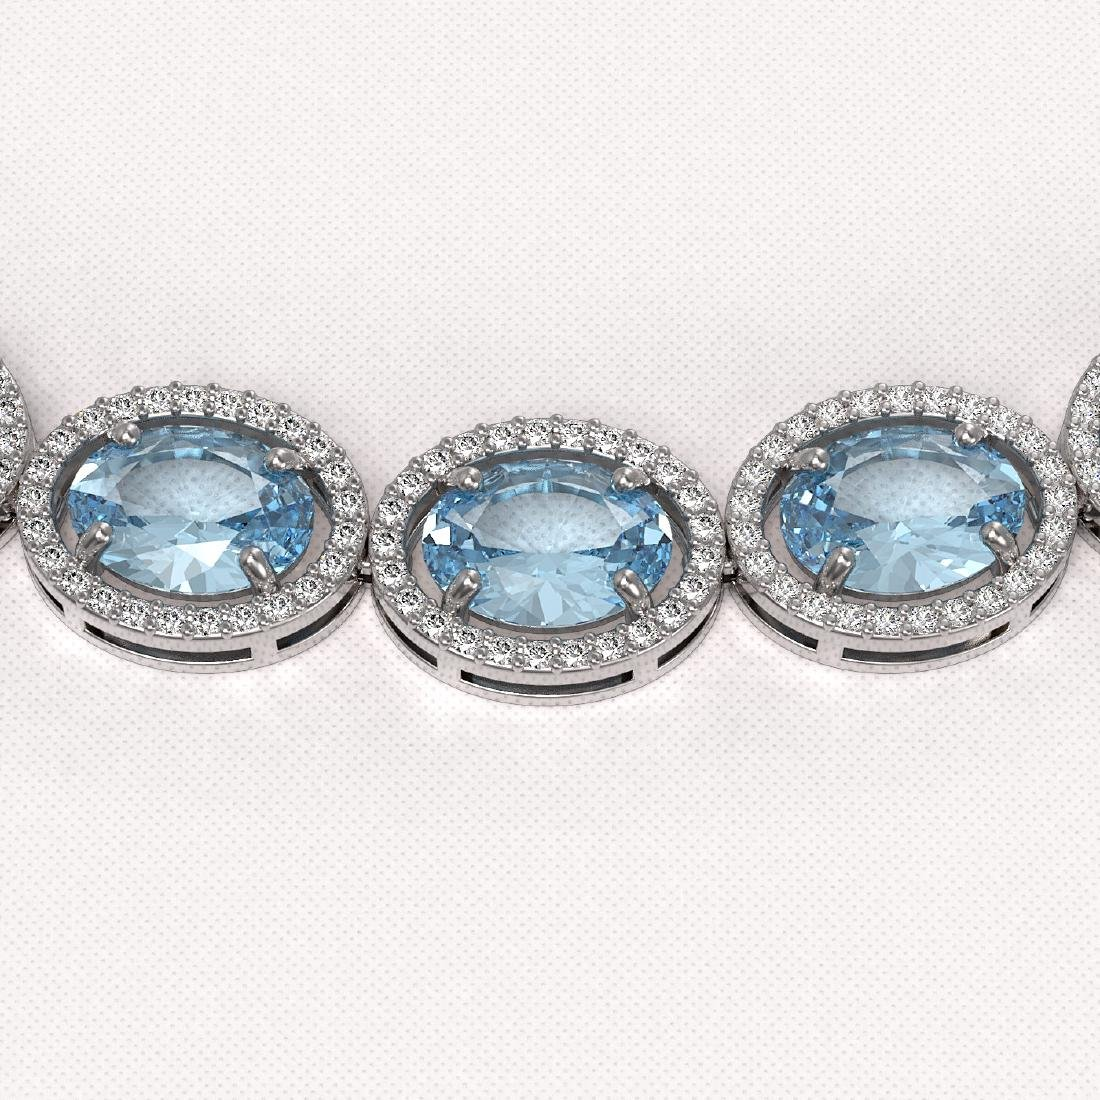 54.11 CTW Aquamarine & Diamond Halo Necklace 10K White - 3